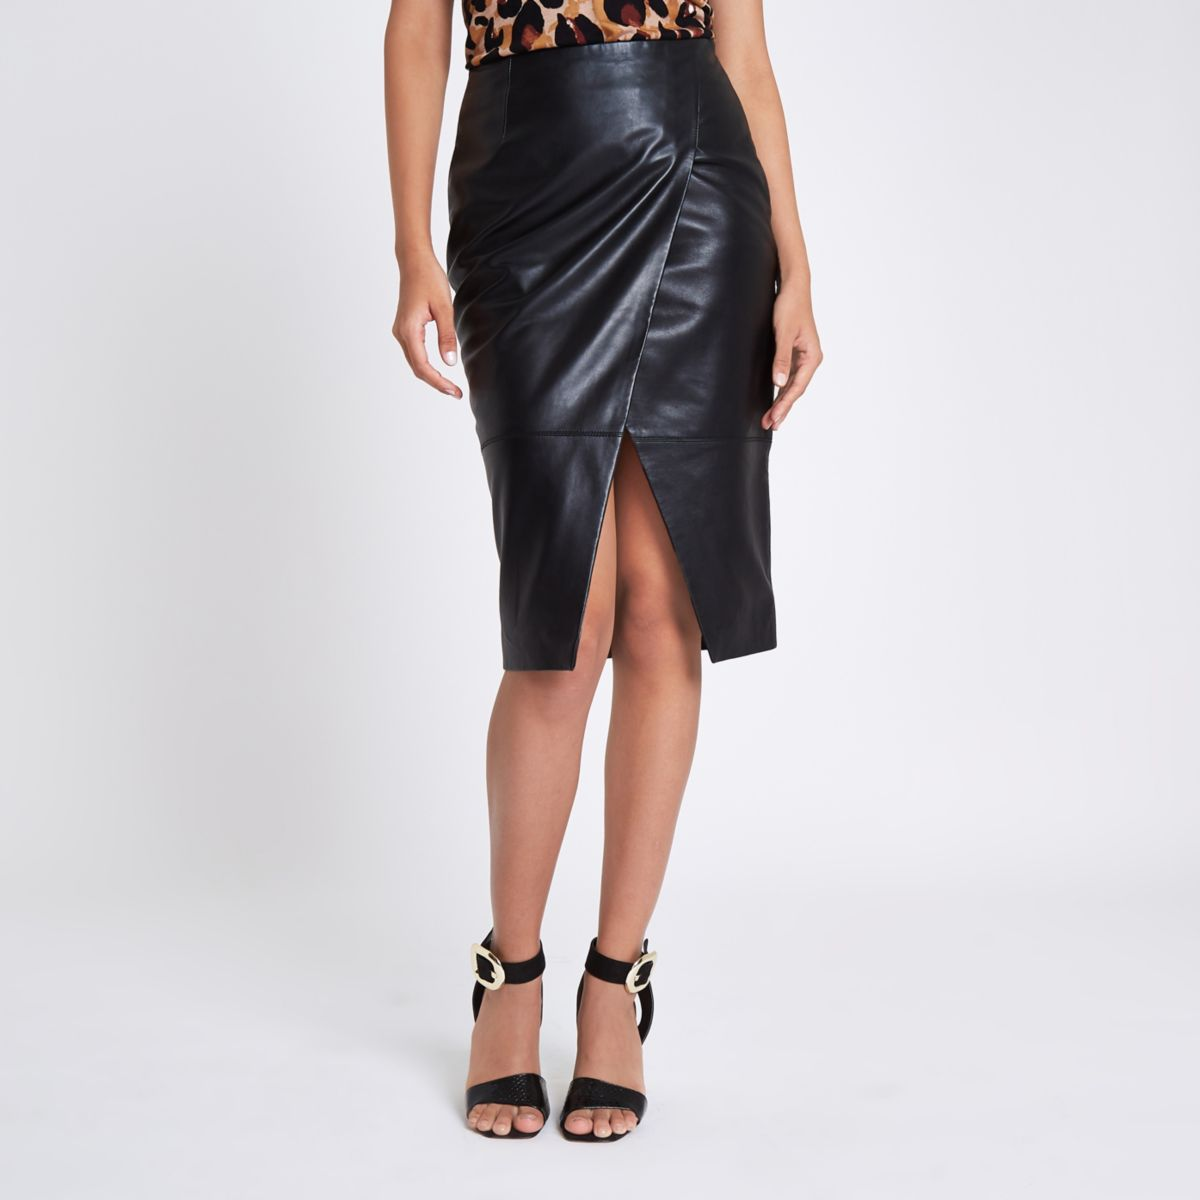 Black leather wrap pencil skirt